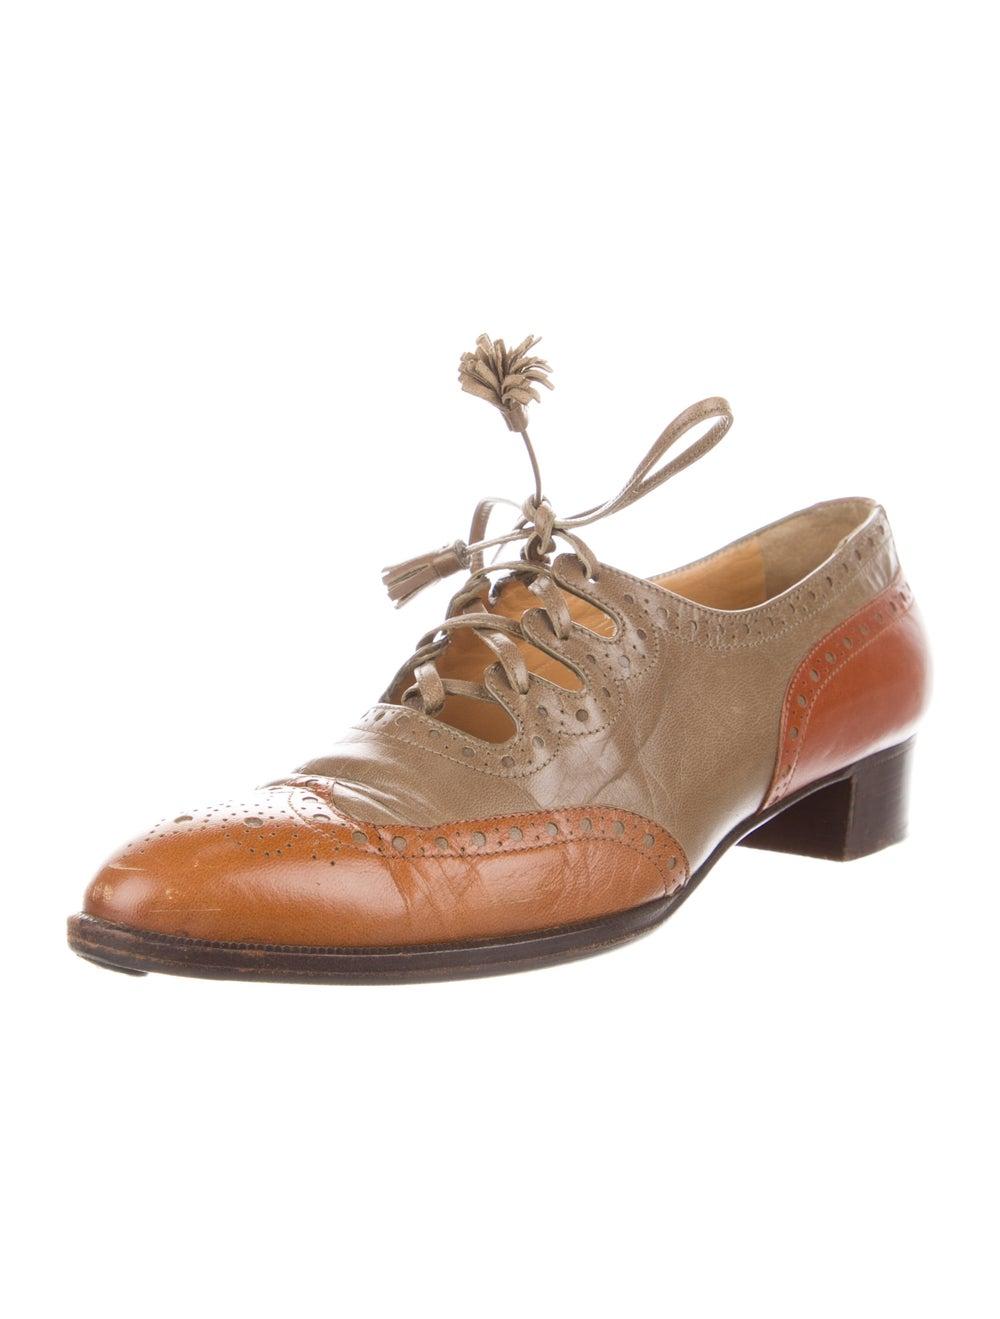 Hermès Vintage Leather Oxfords Brown - image 2